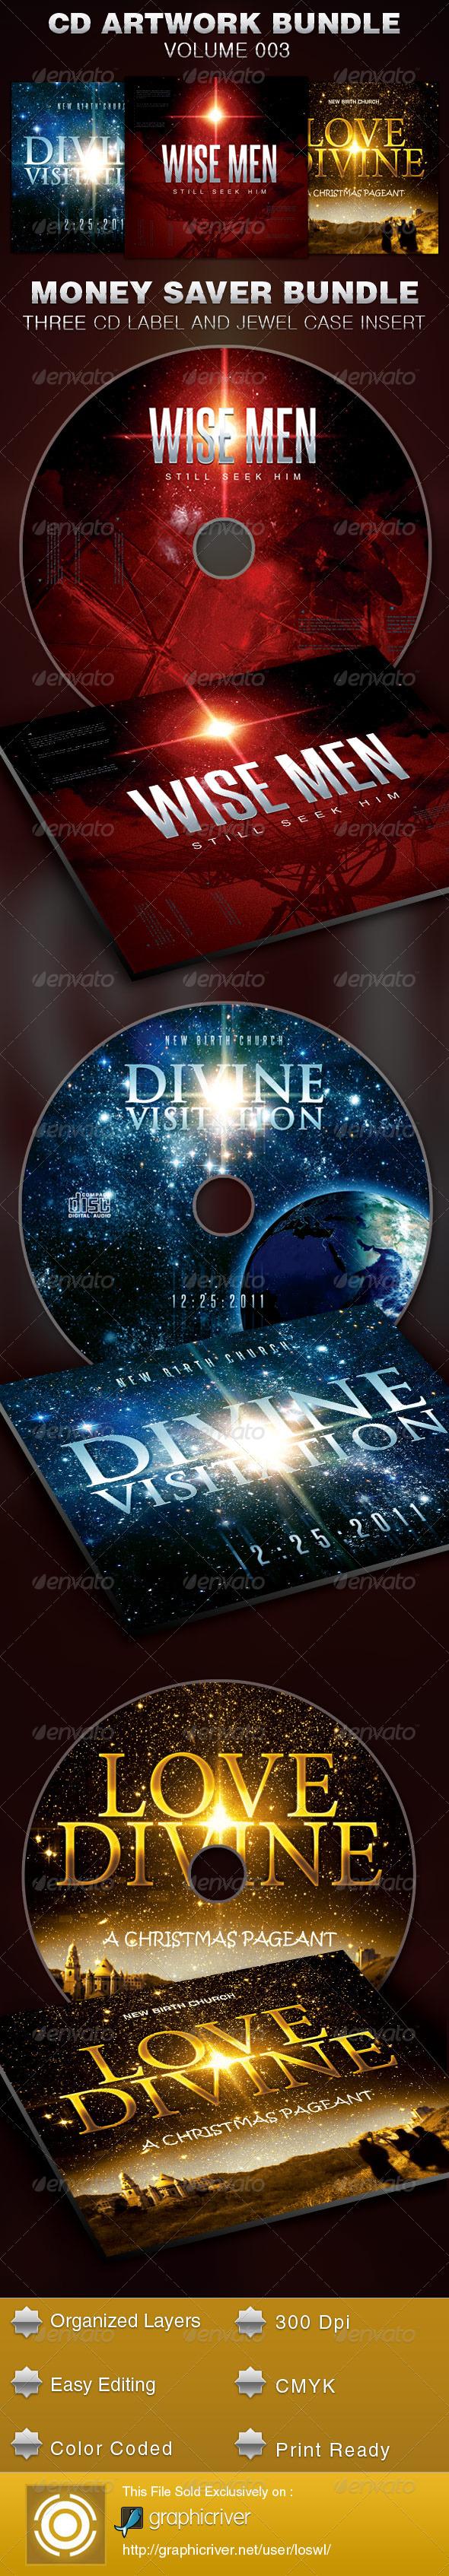 GraphicRiver CD Cover Artwork Bundle-Vol 003 5384443